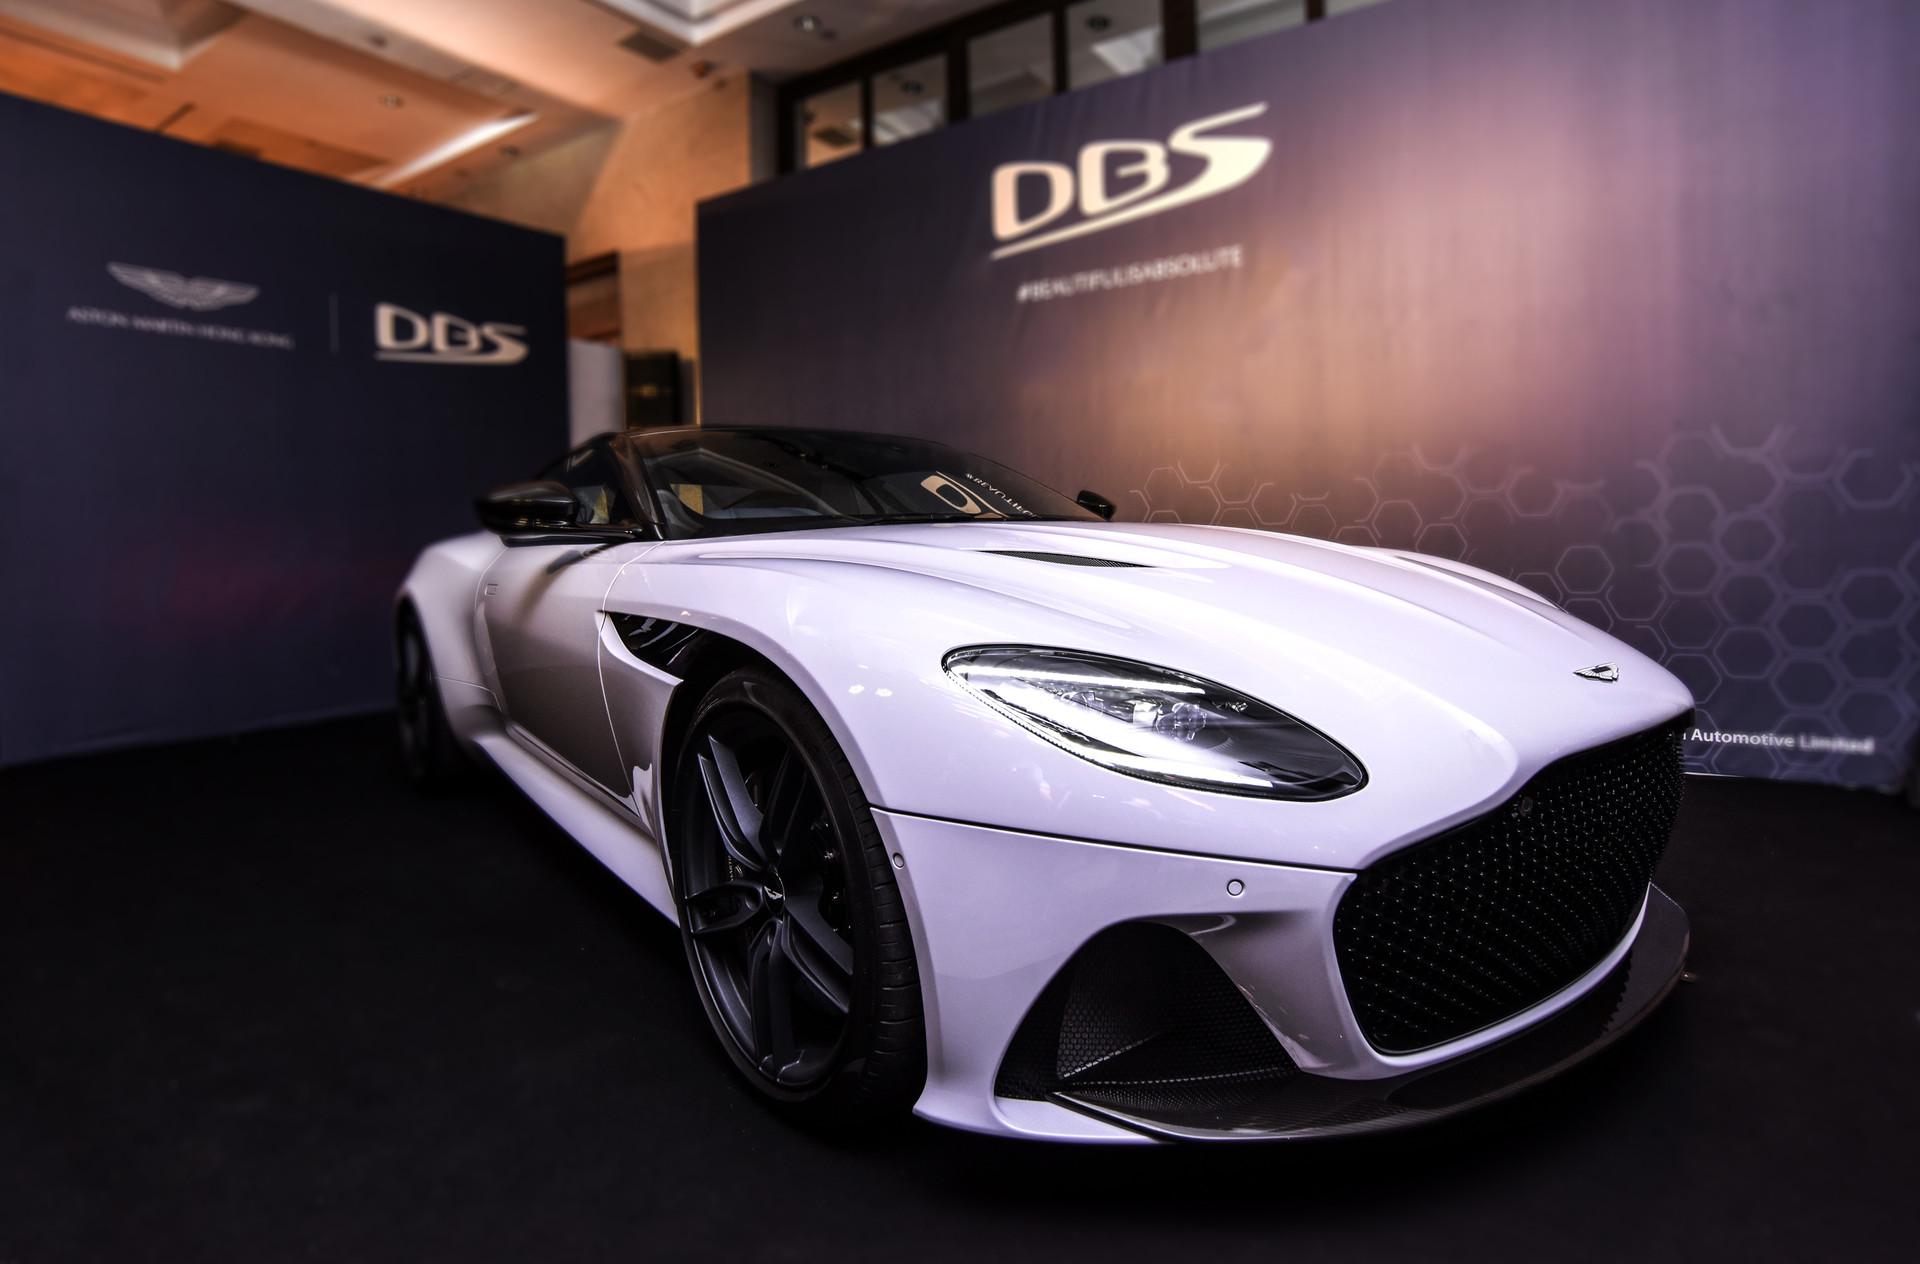 White Aston Martin DBS Superleggera Event in Hong Kong